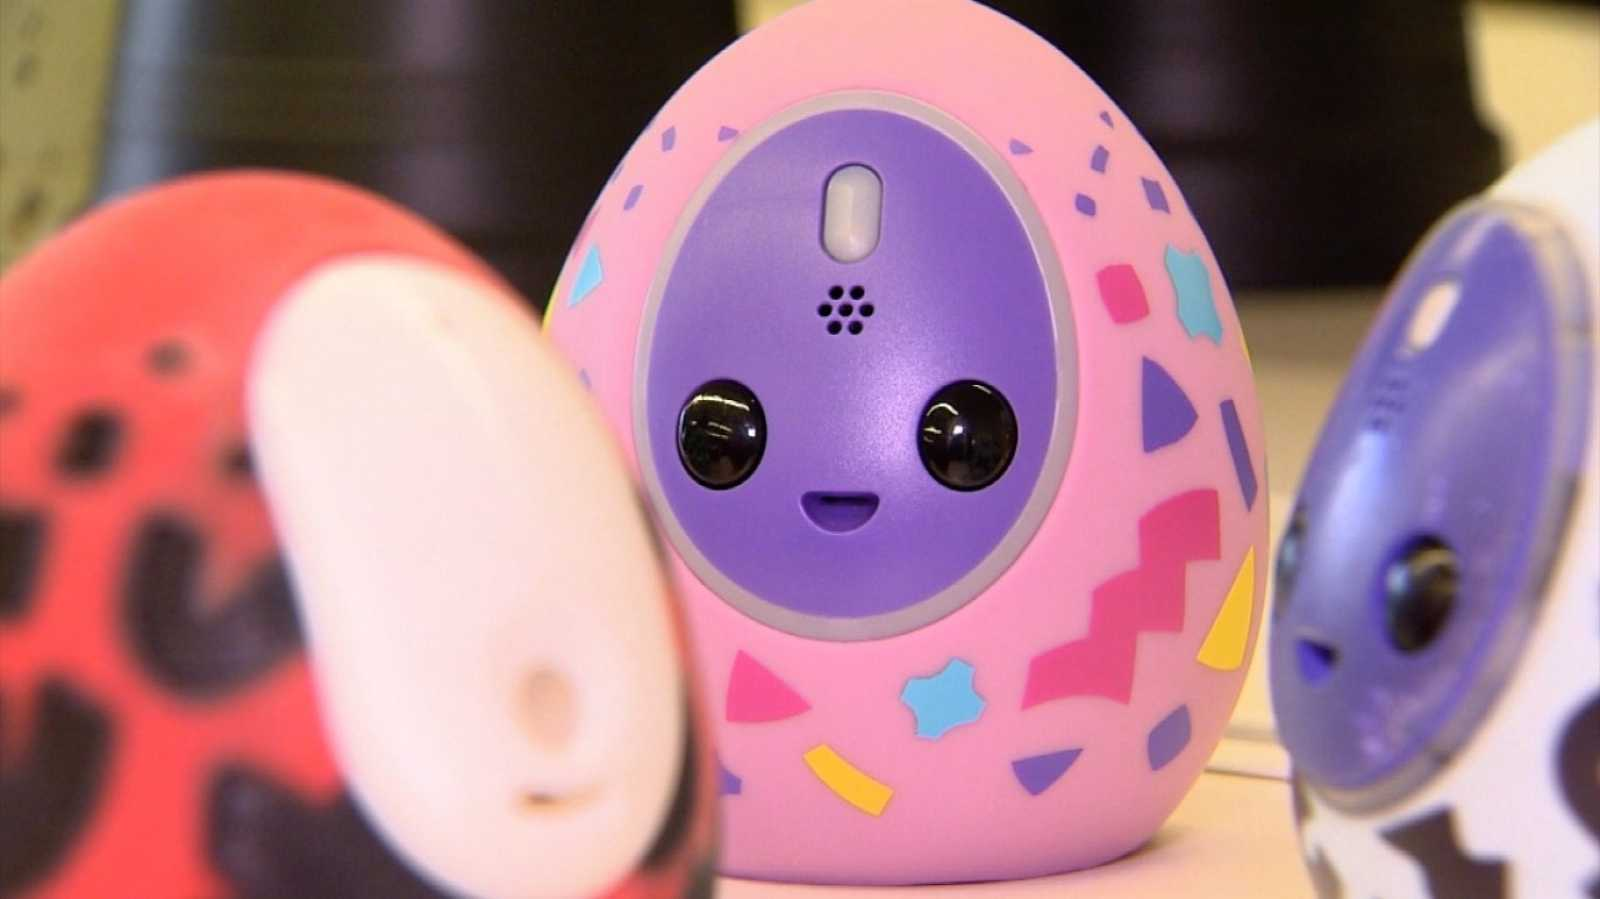 Zoom Net - Melbits Pod, The Blue Box y iPhone 12 Mini - ver ahora